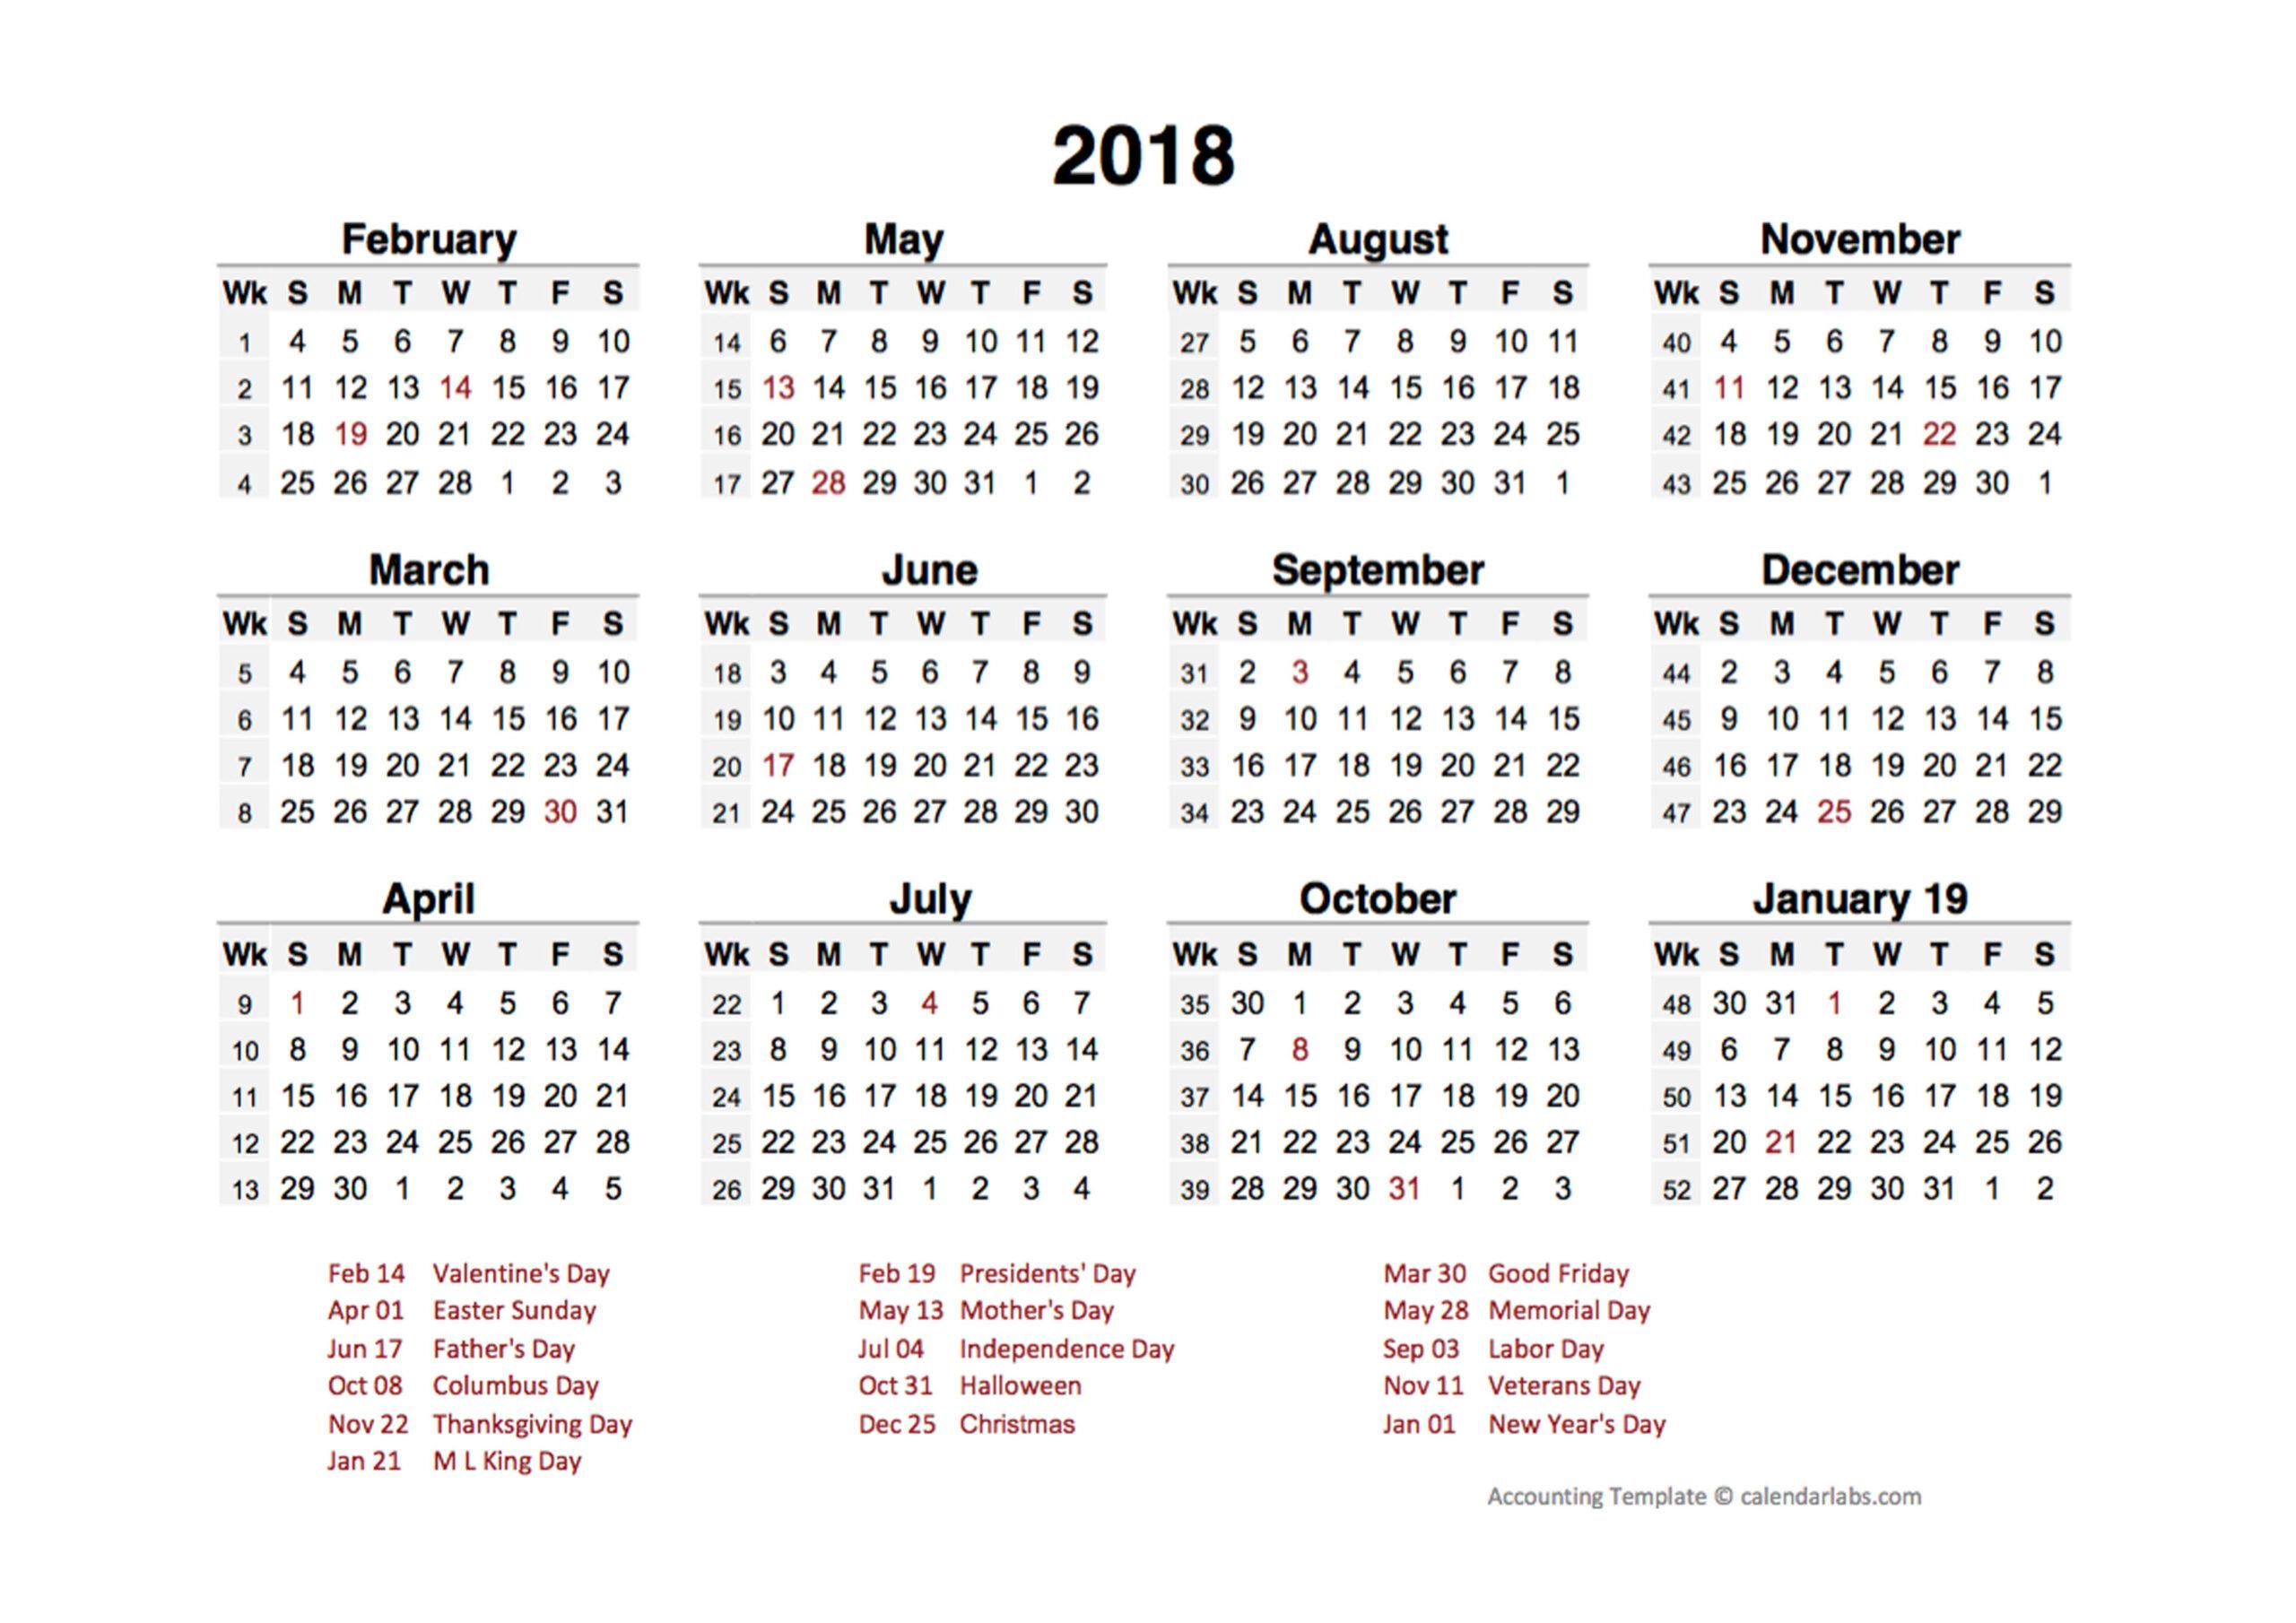 2018 Accounting Period Calendar 4-4-5 - Free Printable regarding Retsil 4 5 4 Cakander